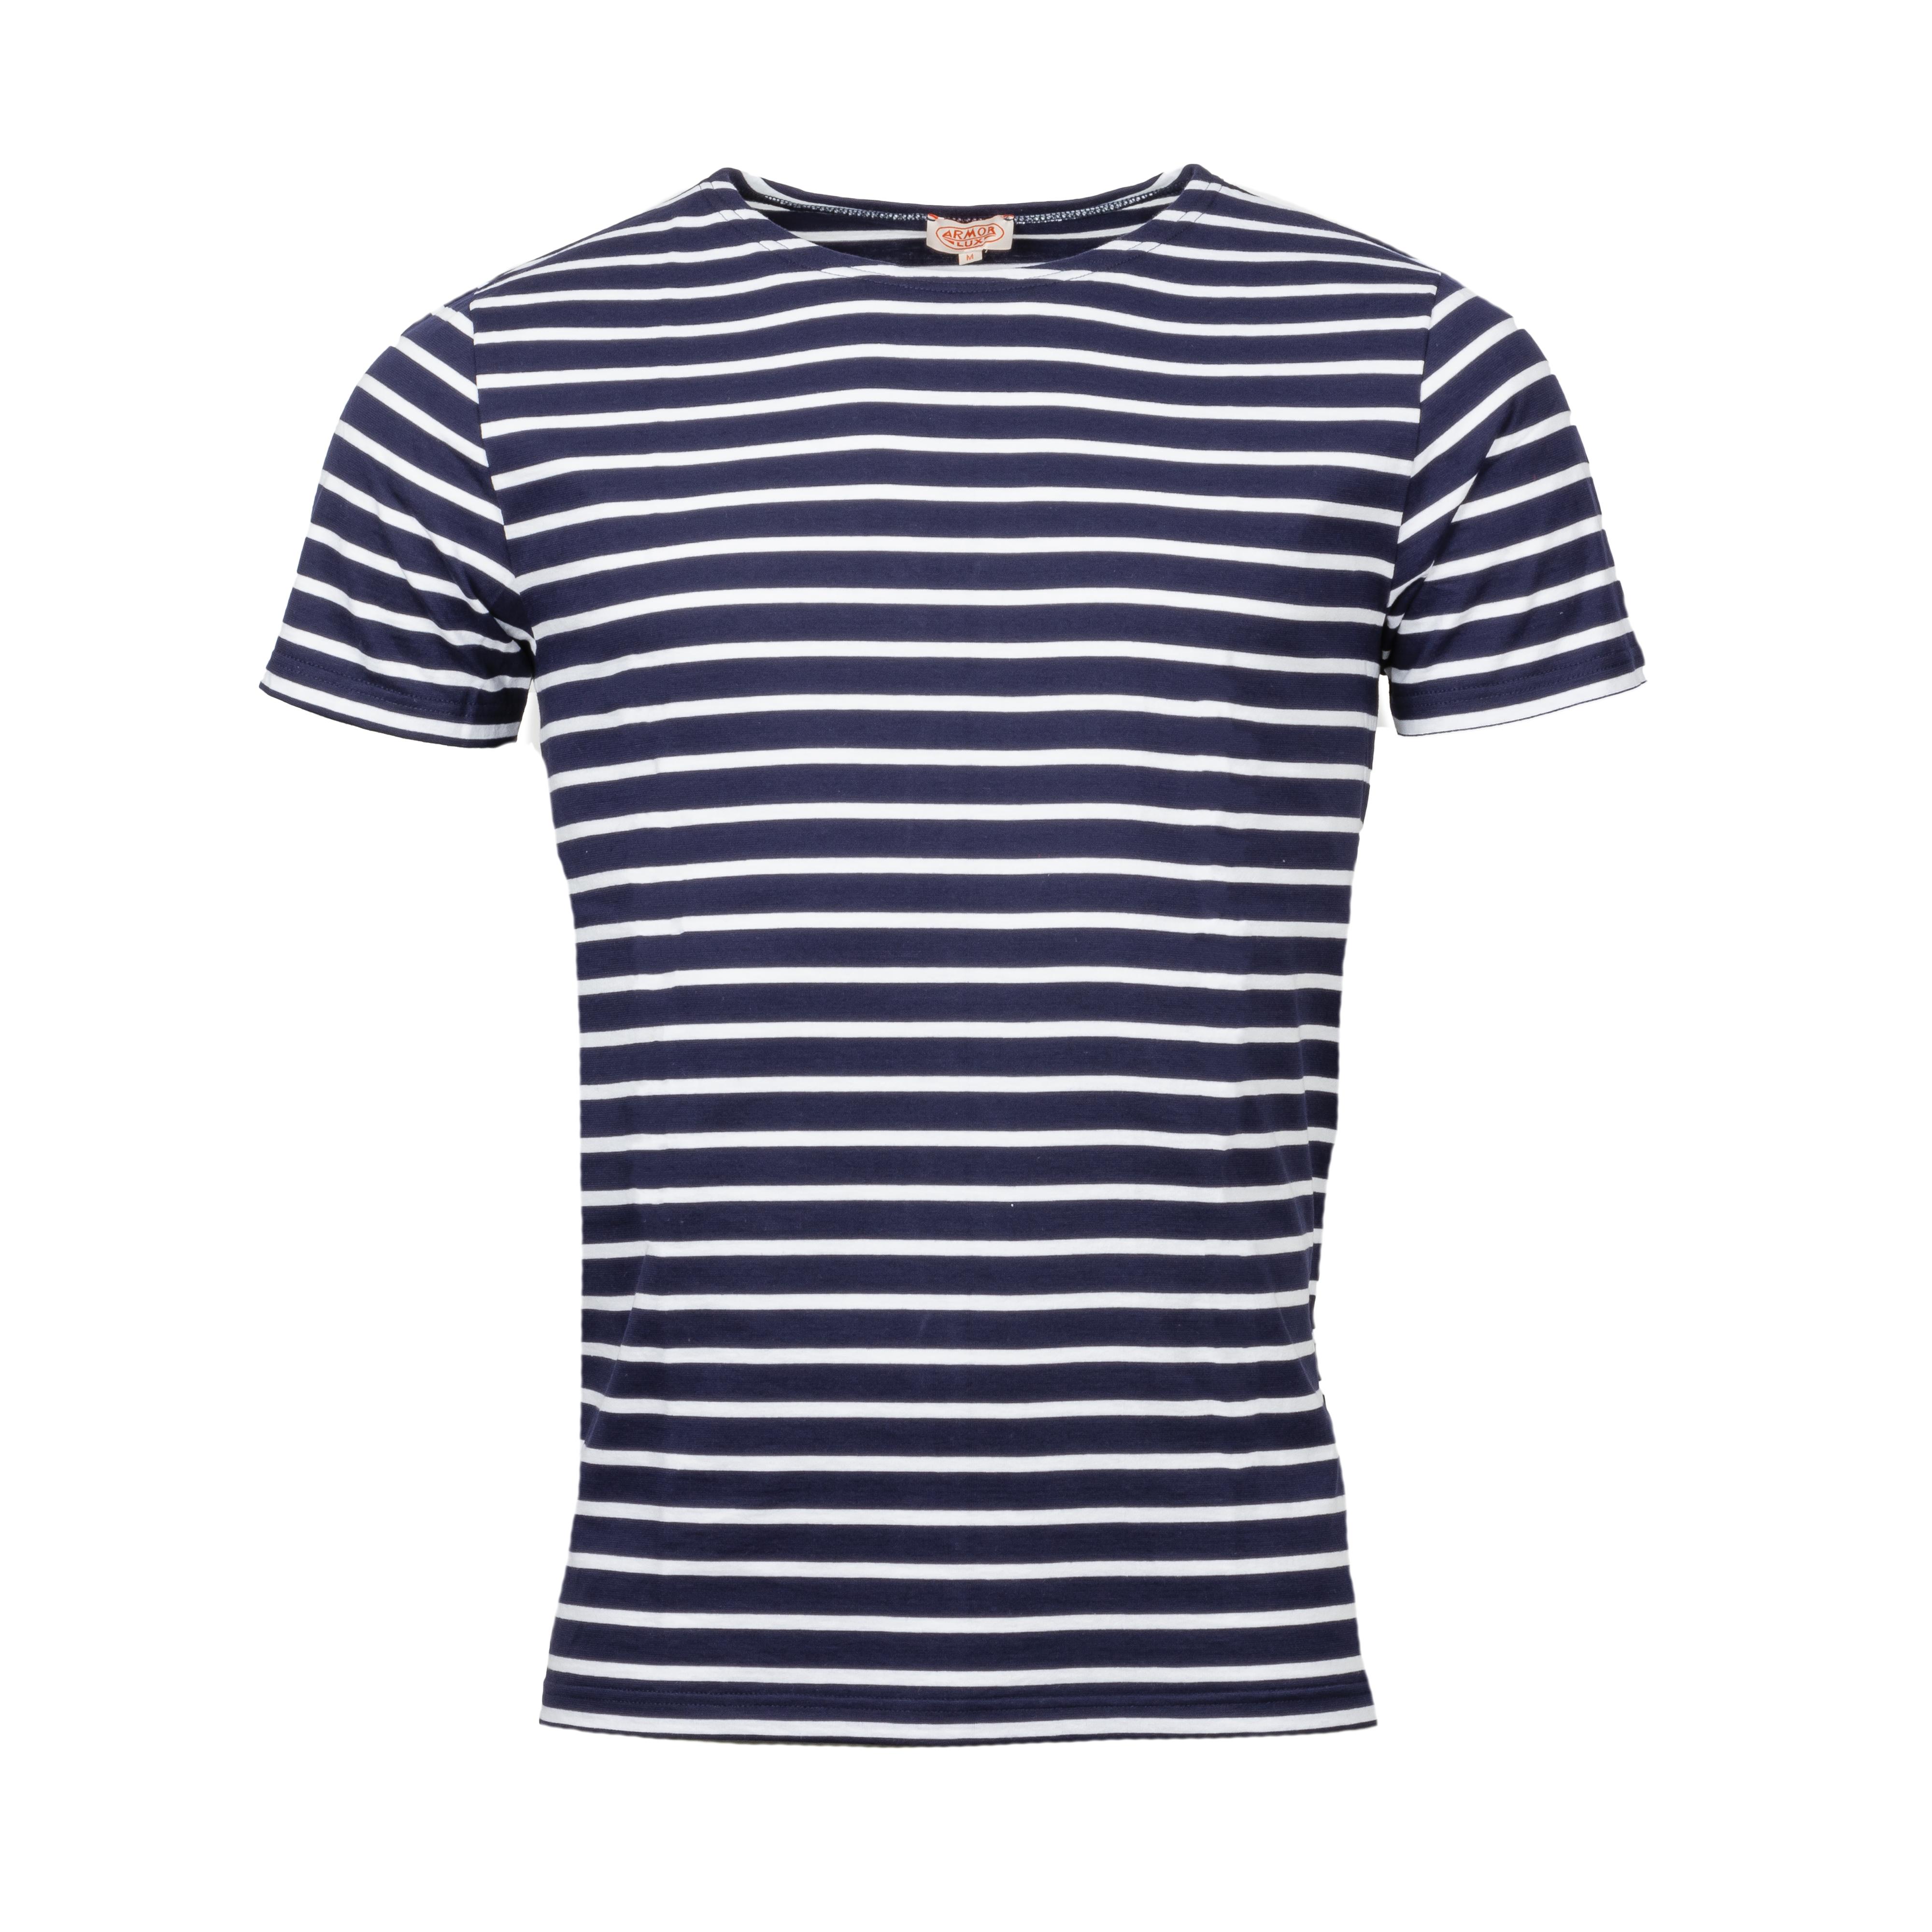 Tee-shirt marinière Armor lux Hoëdic en coton bleu marine rayé blanc